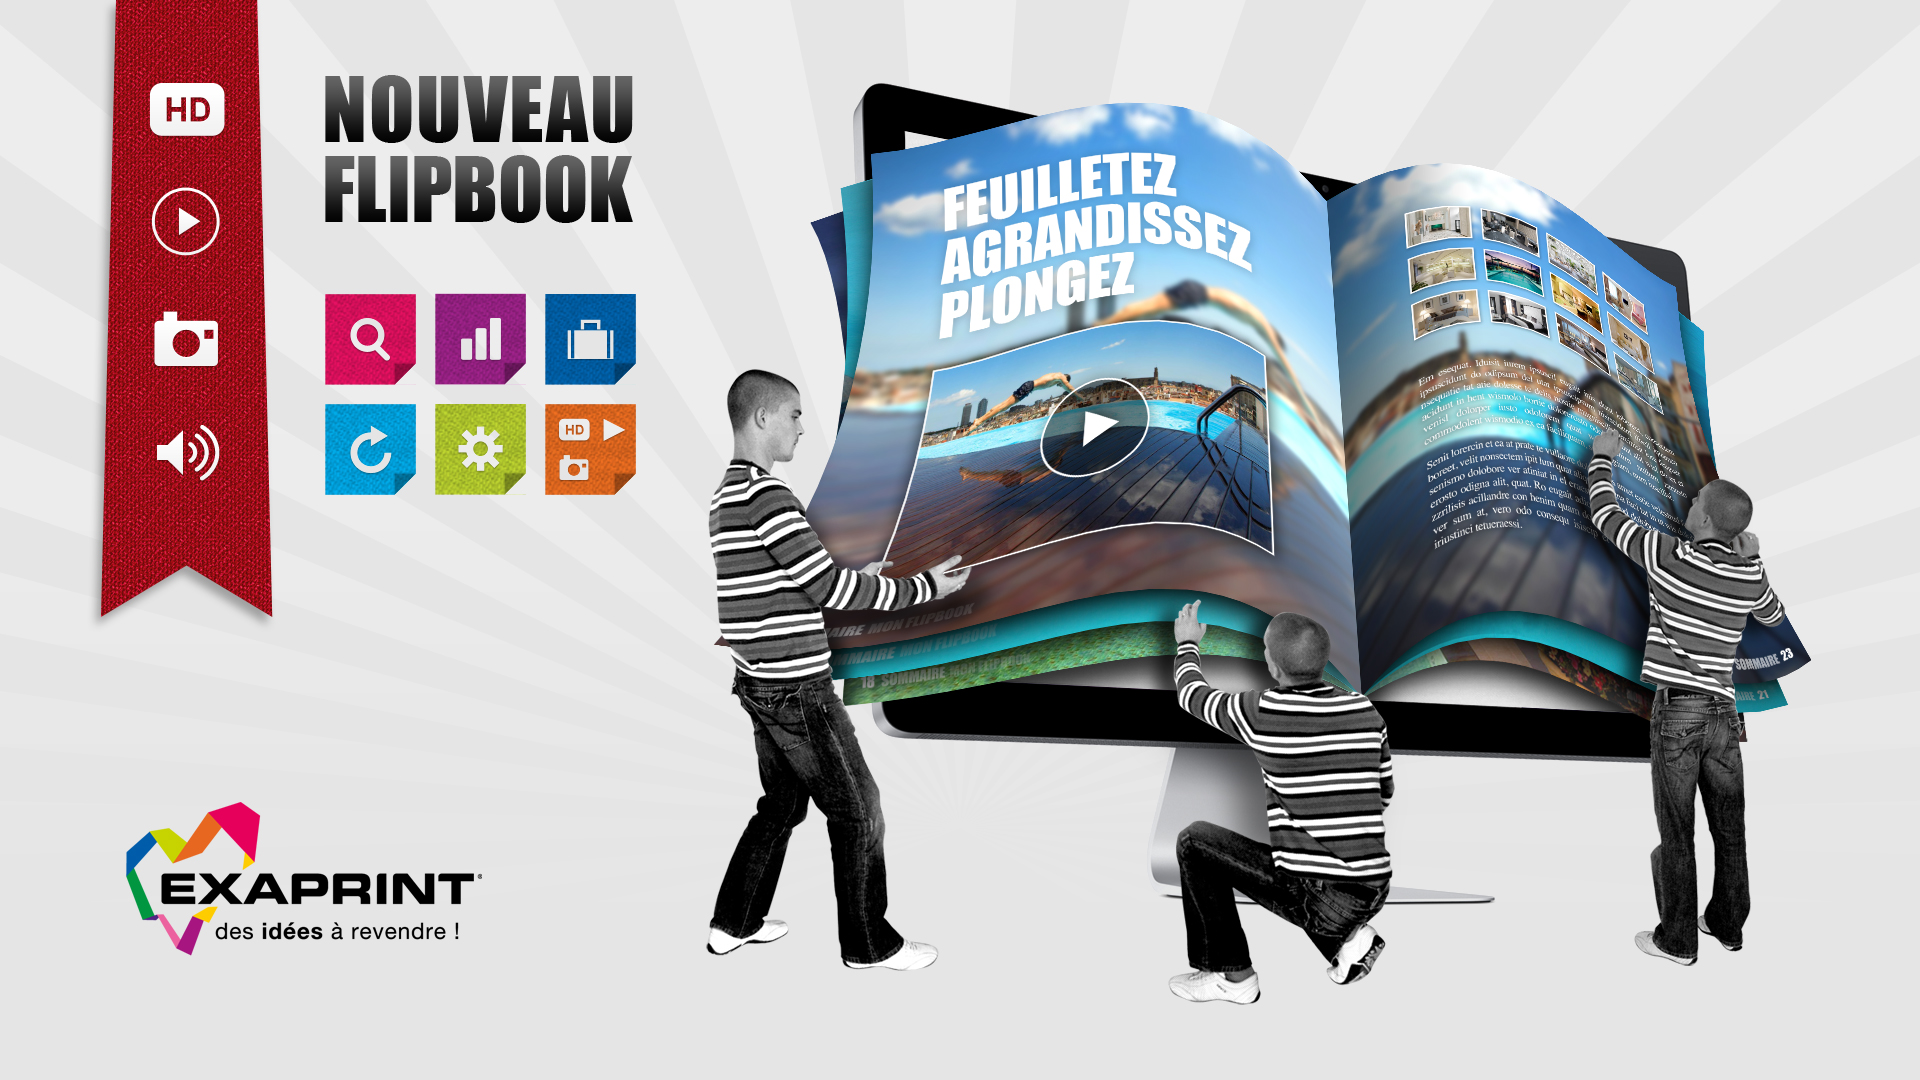 exaprint-flipbook-creation-concept-visuel-mailing-site-internet-communication-caconcept-alexis-cretin-graphiste